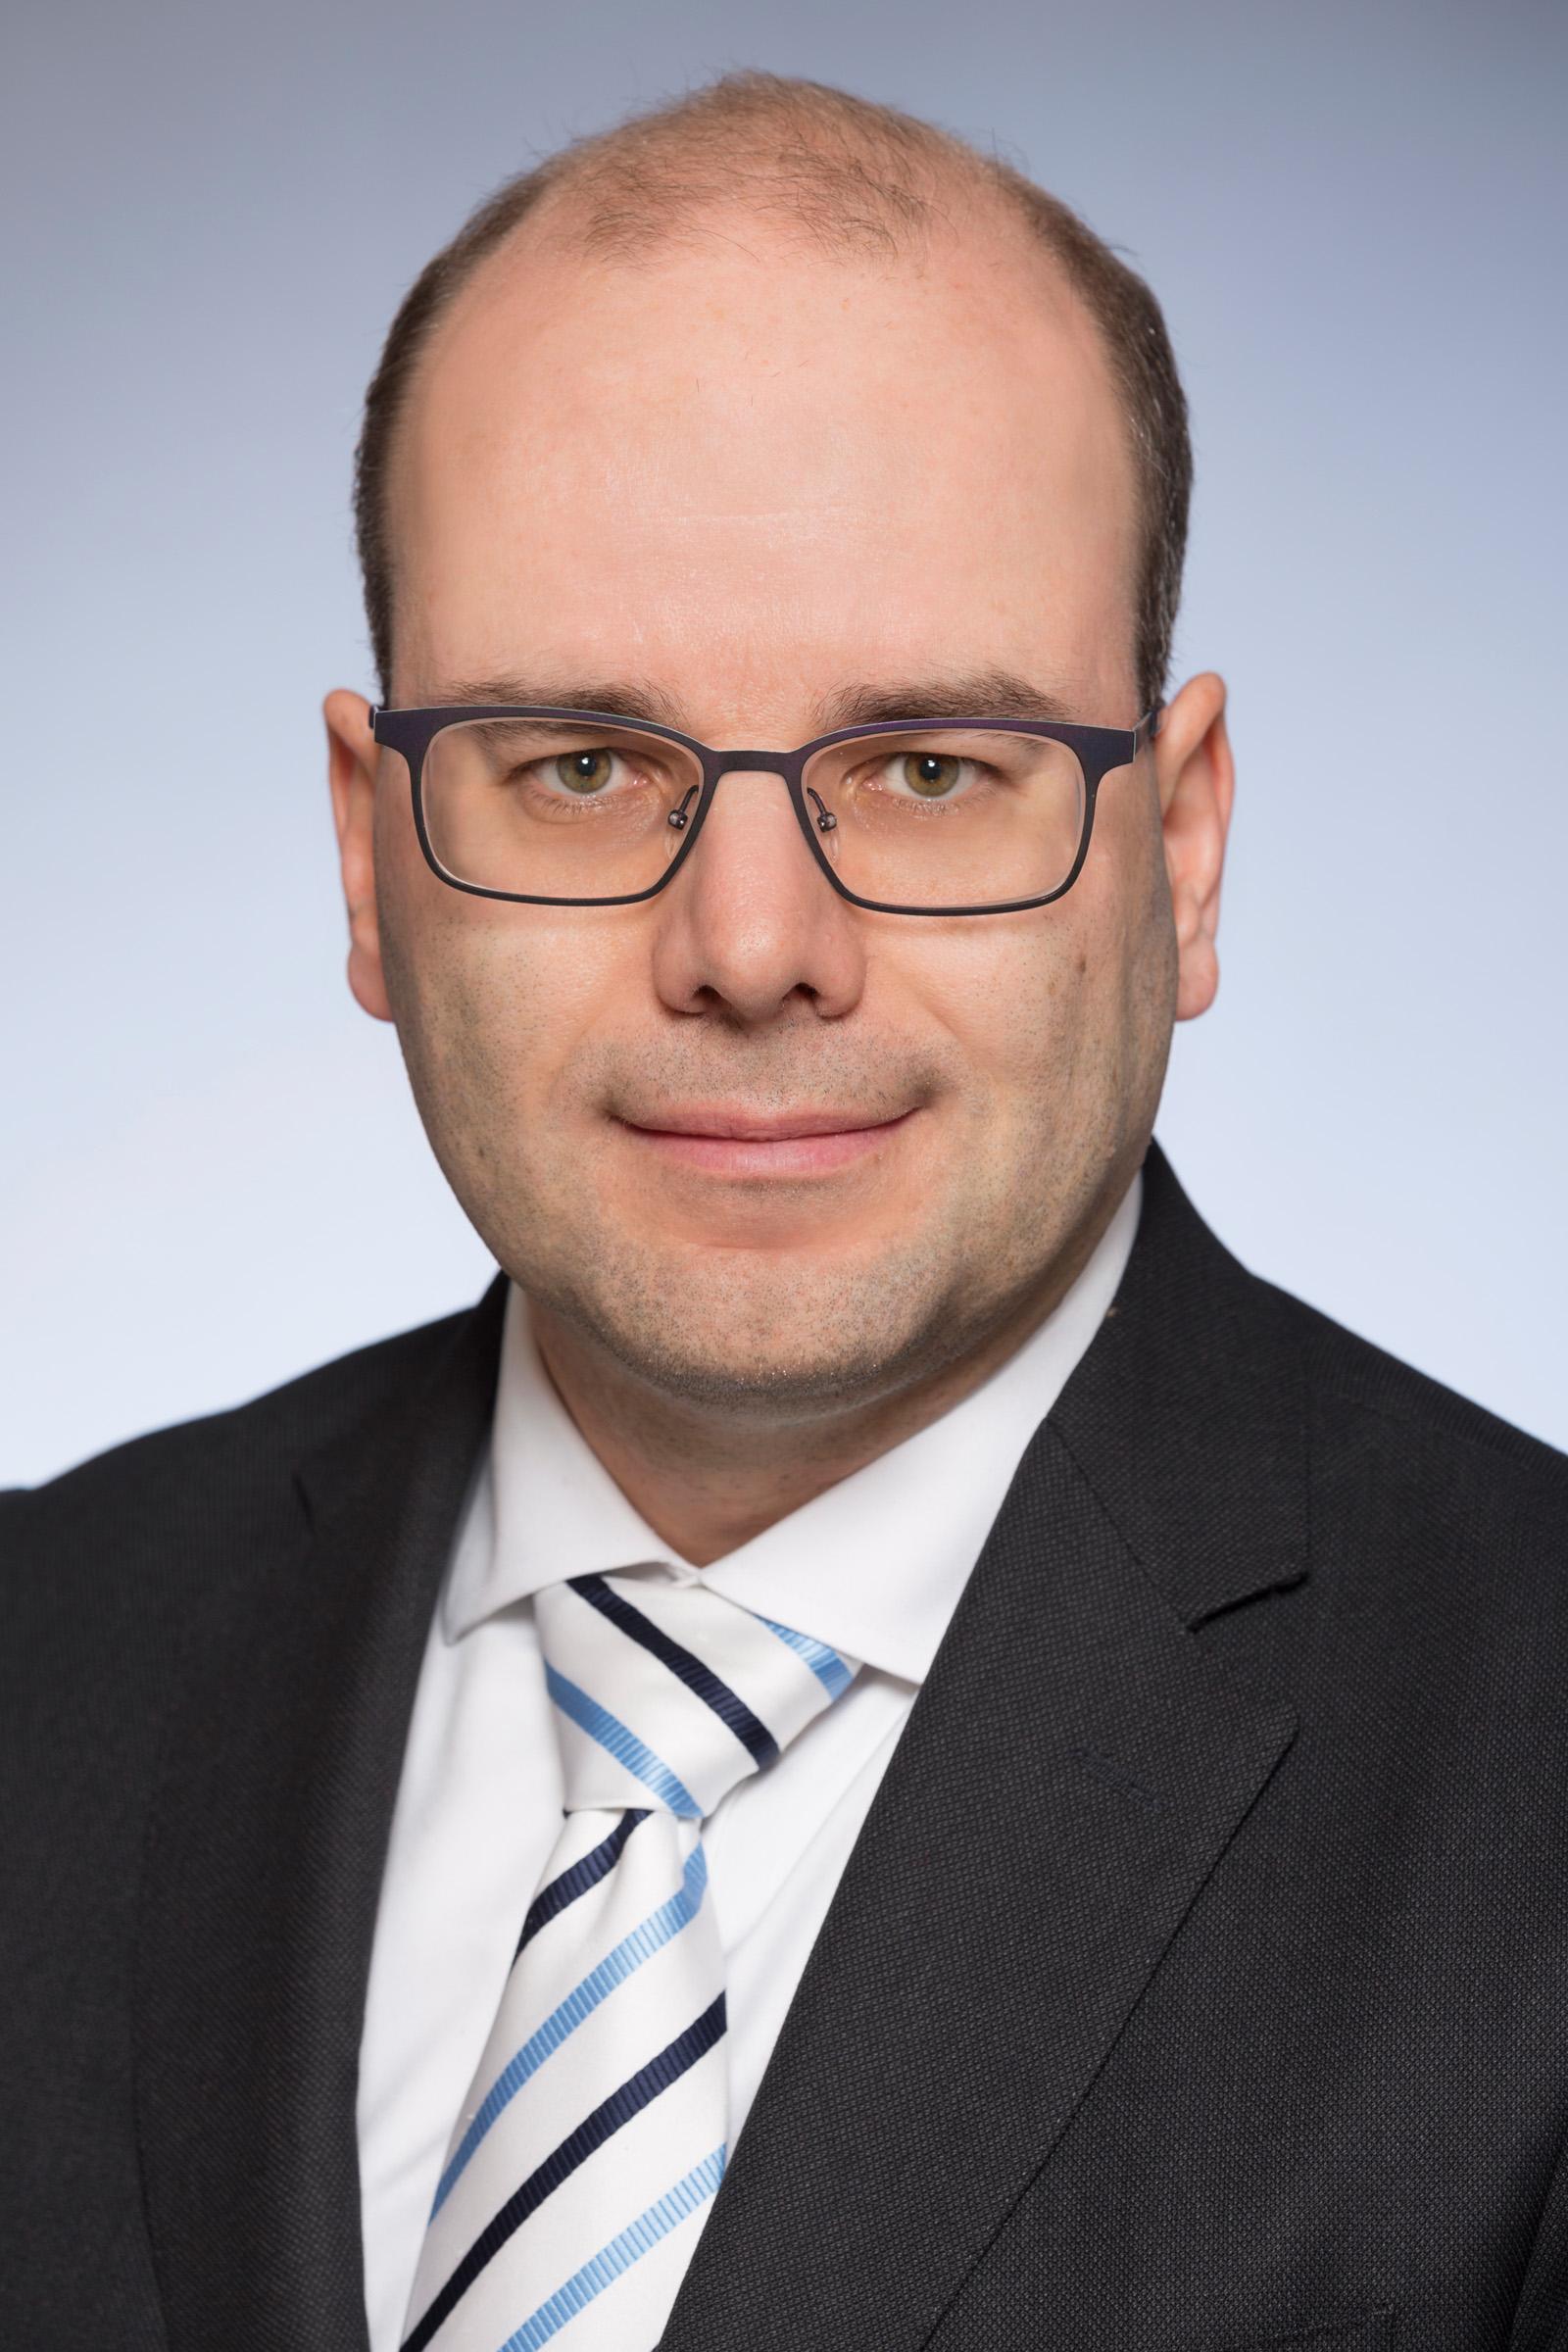 Rainer Knyrim